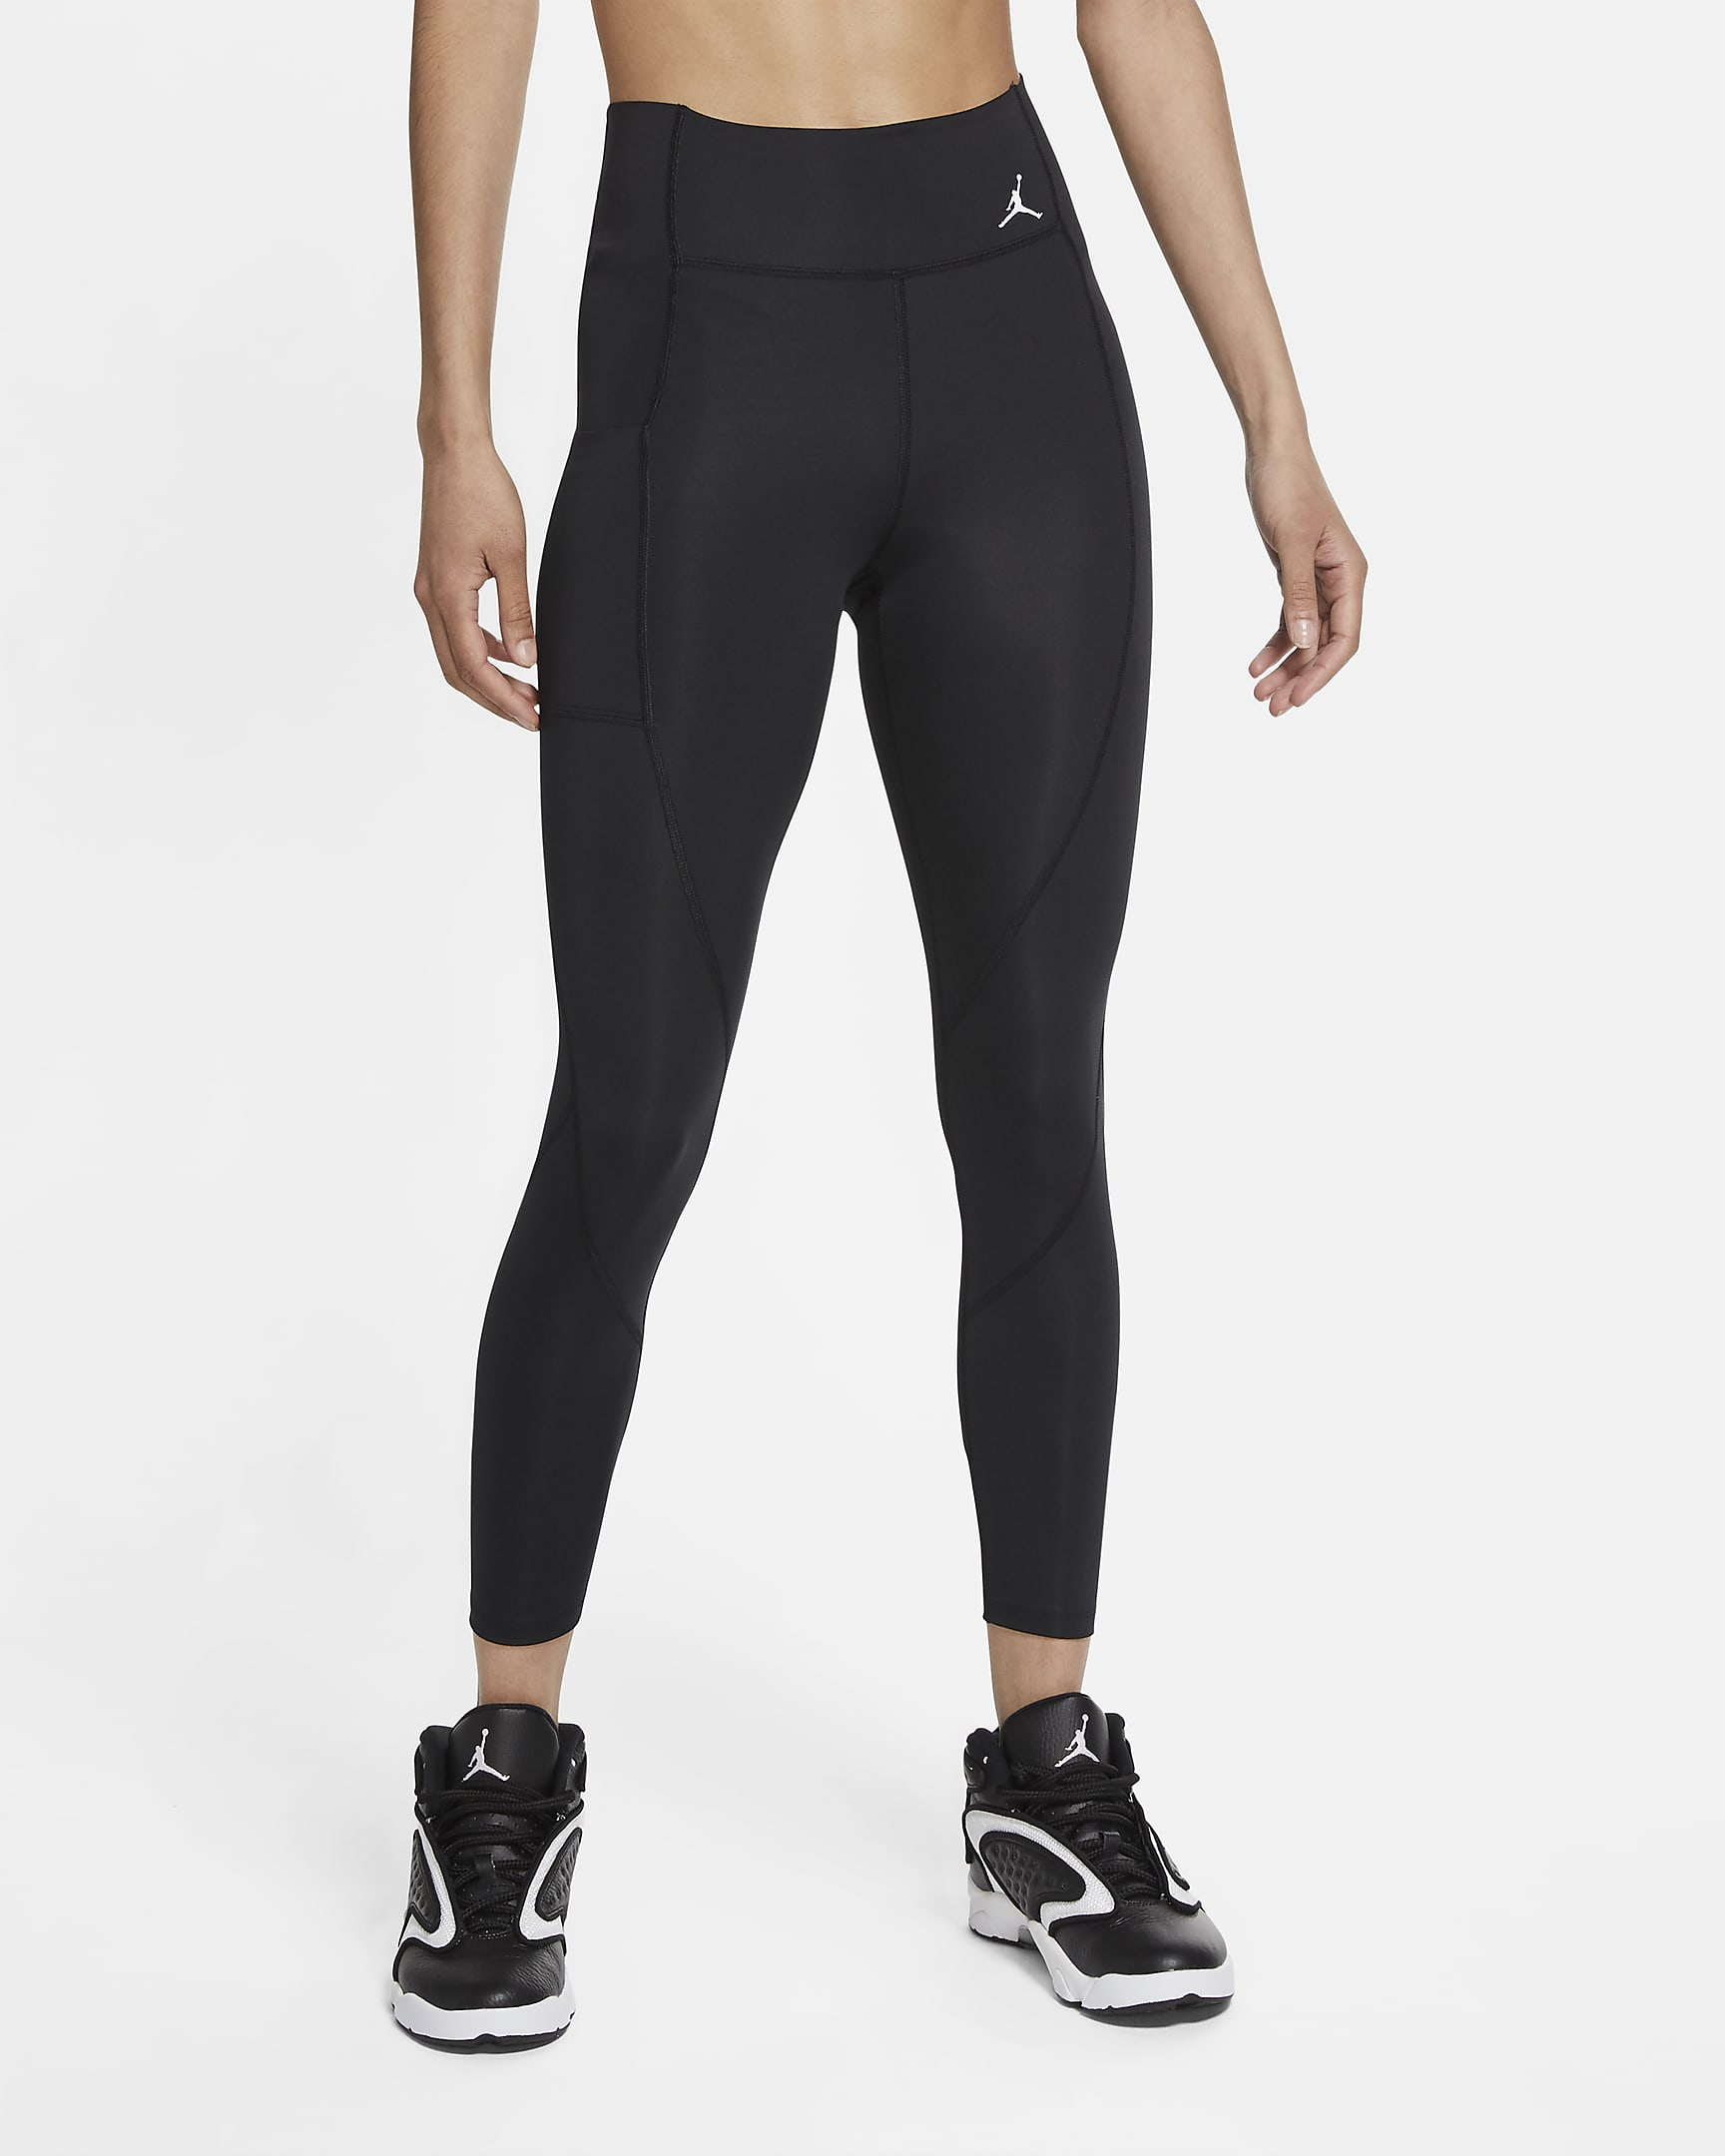 jordan-essential-womens-7-8-leggings-N3lDkx.png